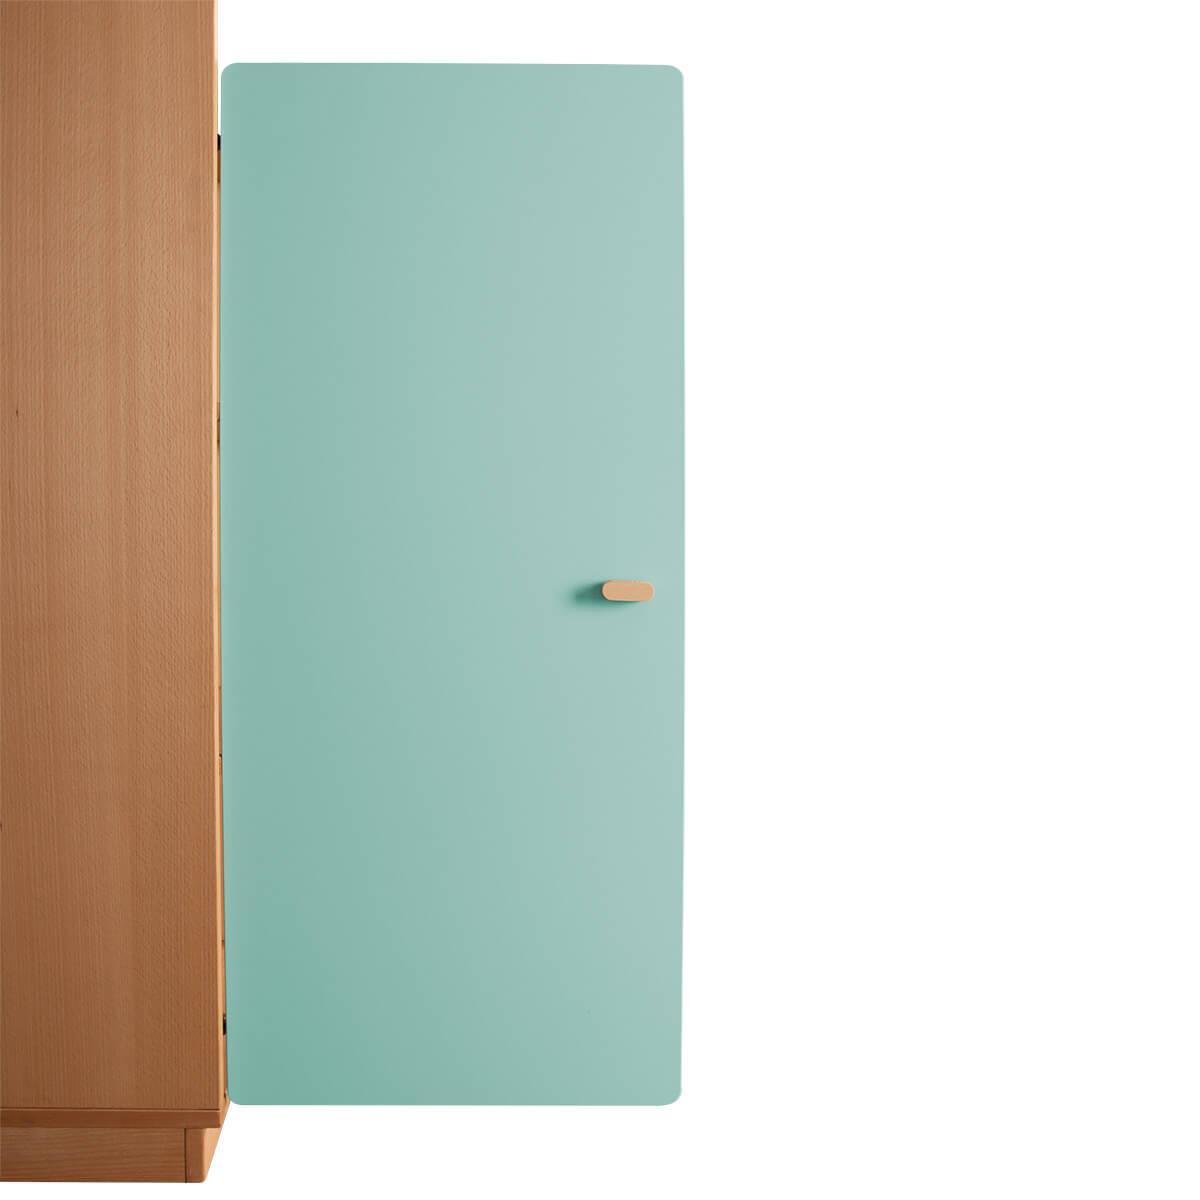 Schranktür 3/5 106cm-Griff DESTYLE de Breuyn MDF mint-lackiert